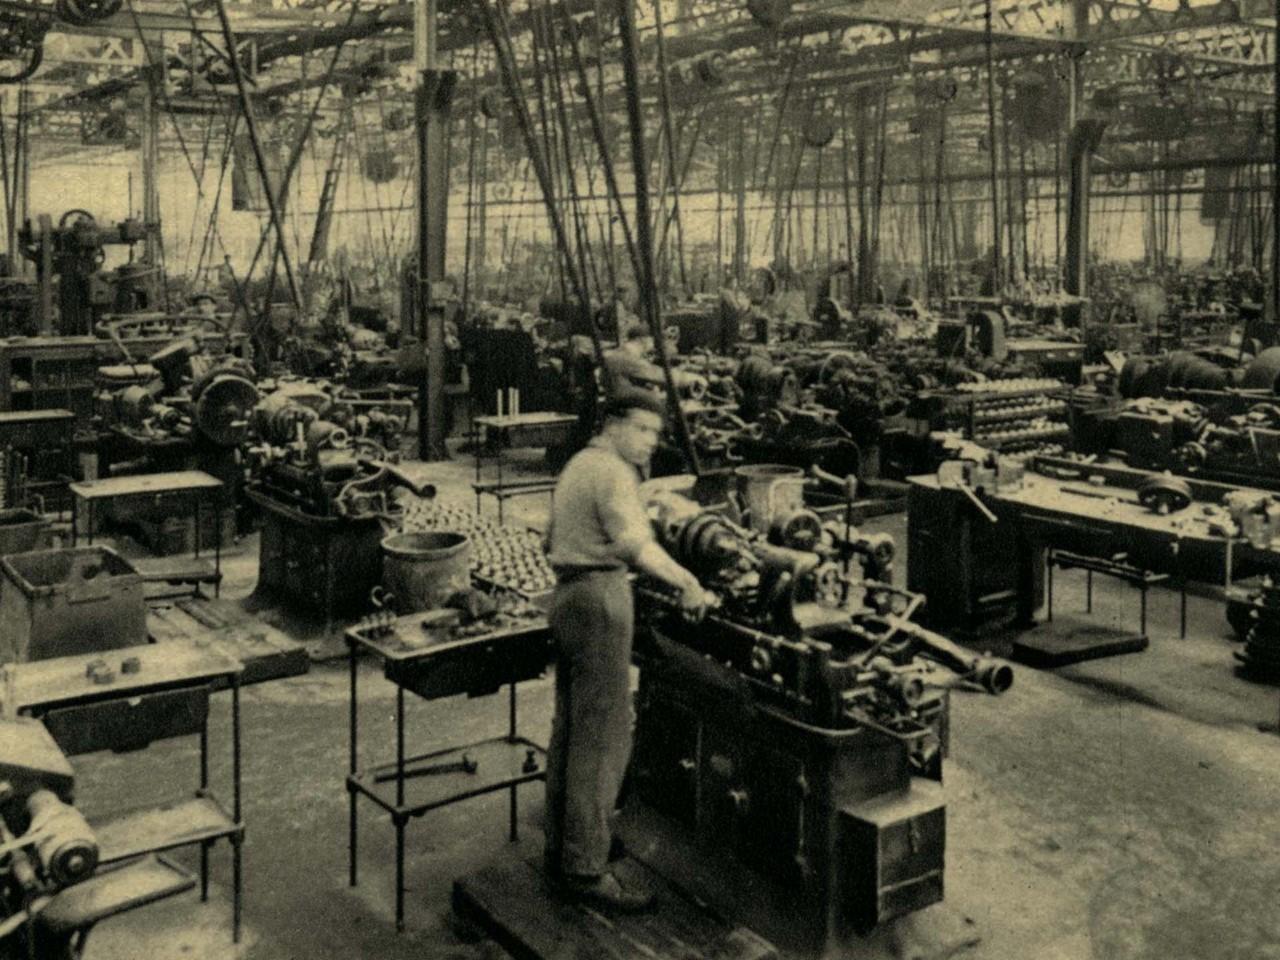 455 - Vénissieux (Rhône) usines Berliet